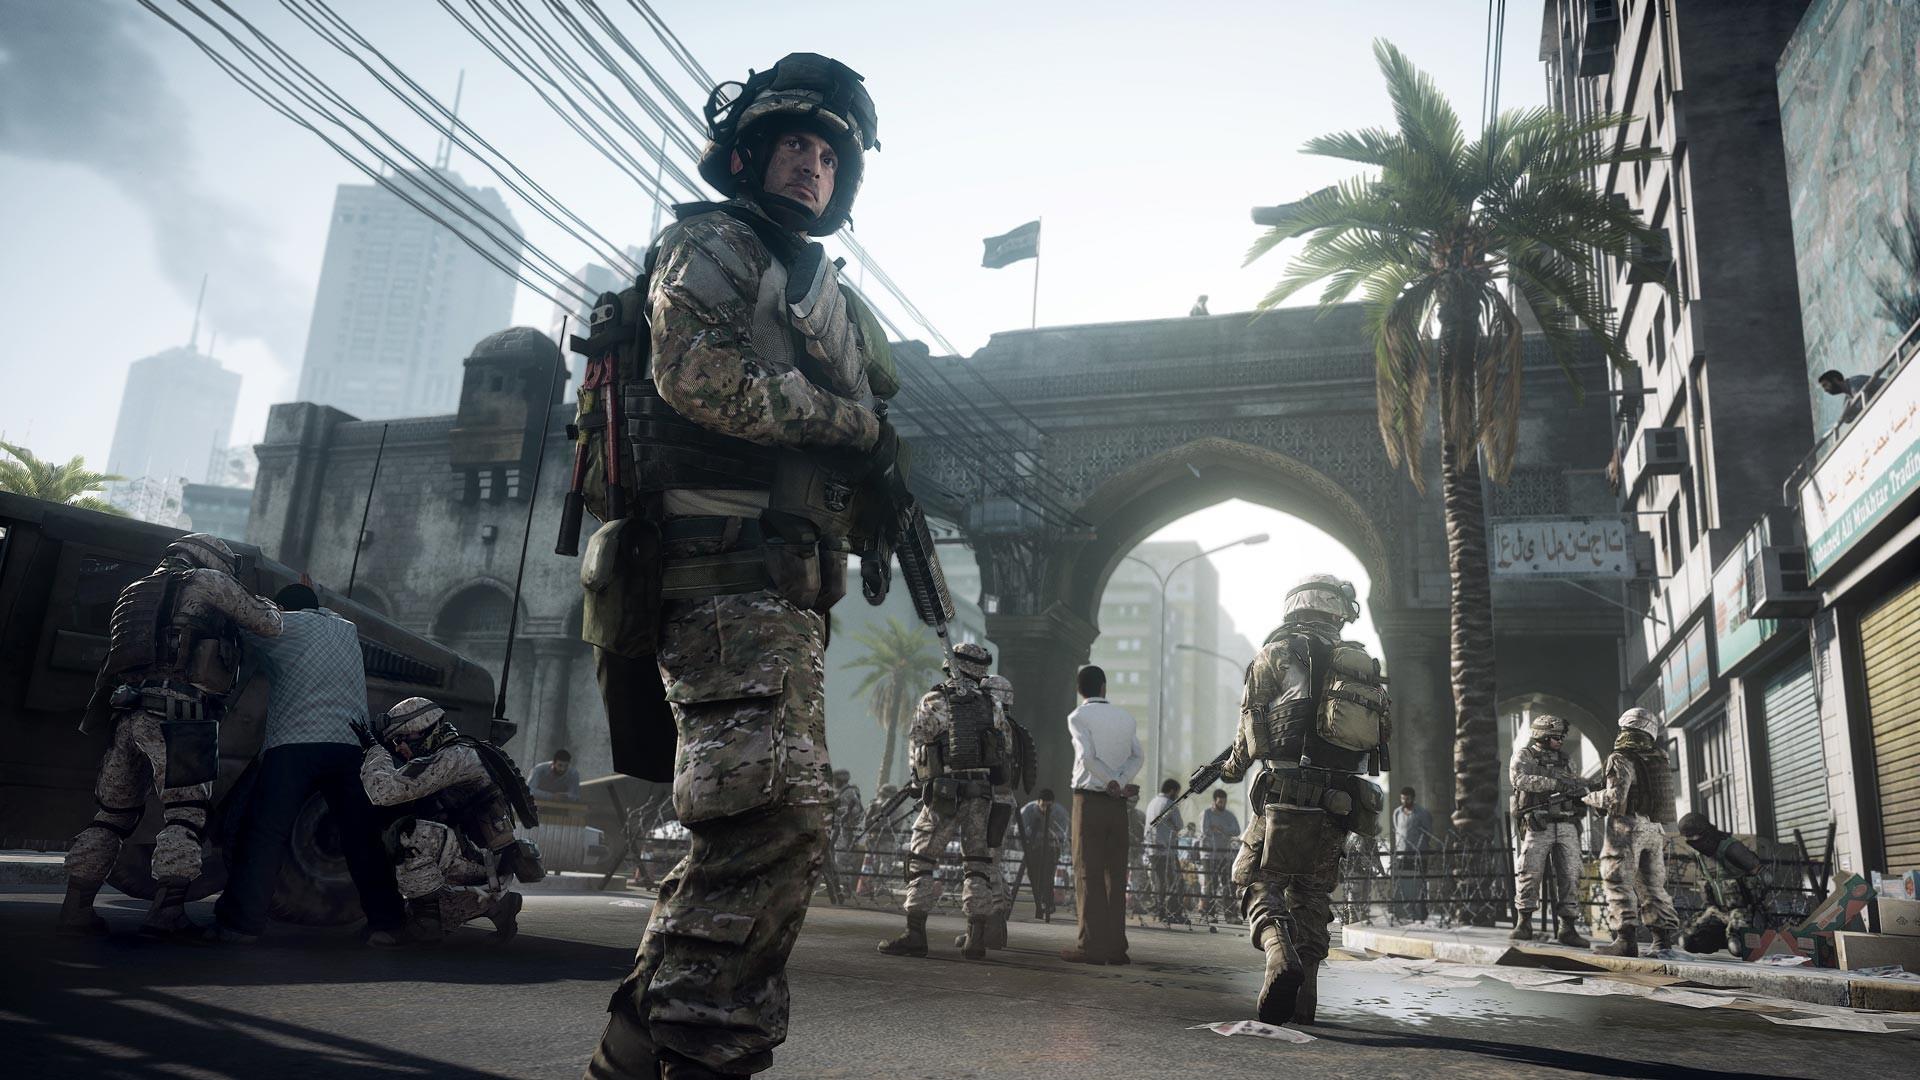 Image Source: Battlefield 3 Marines